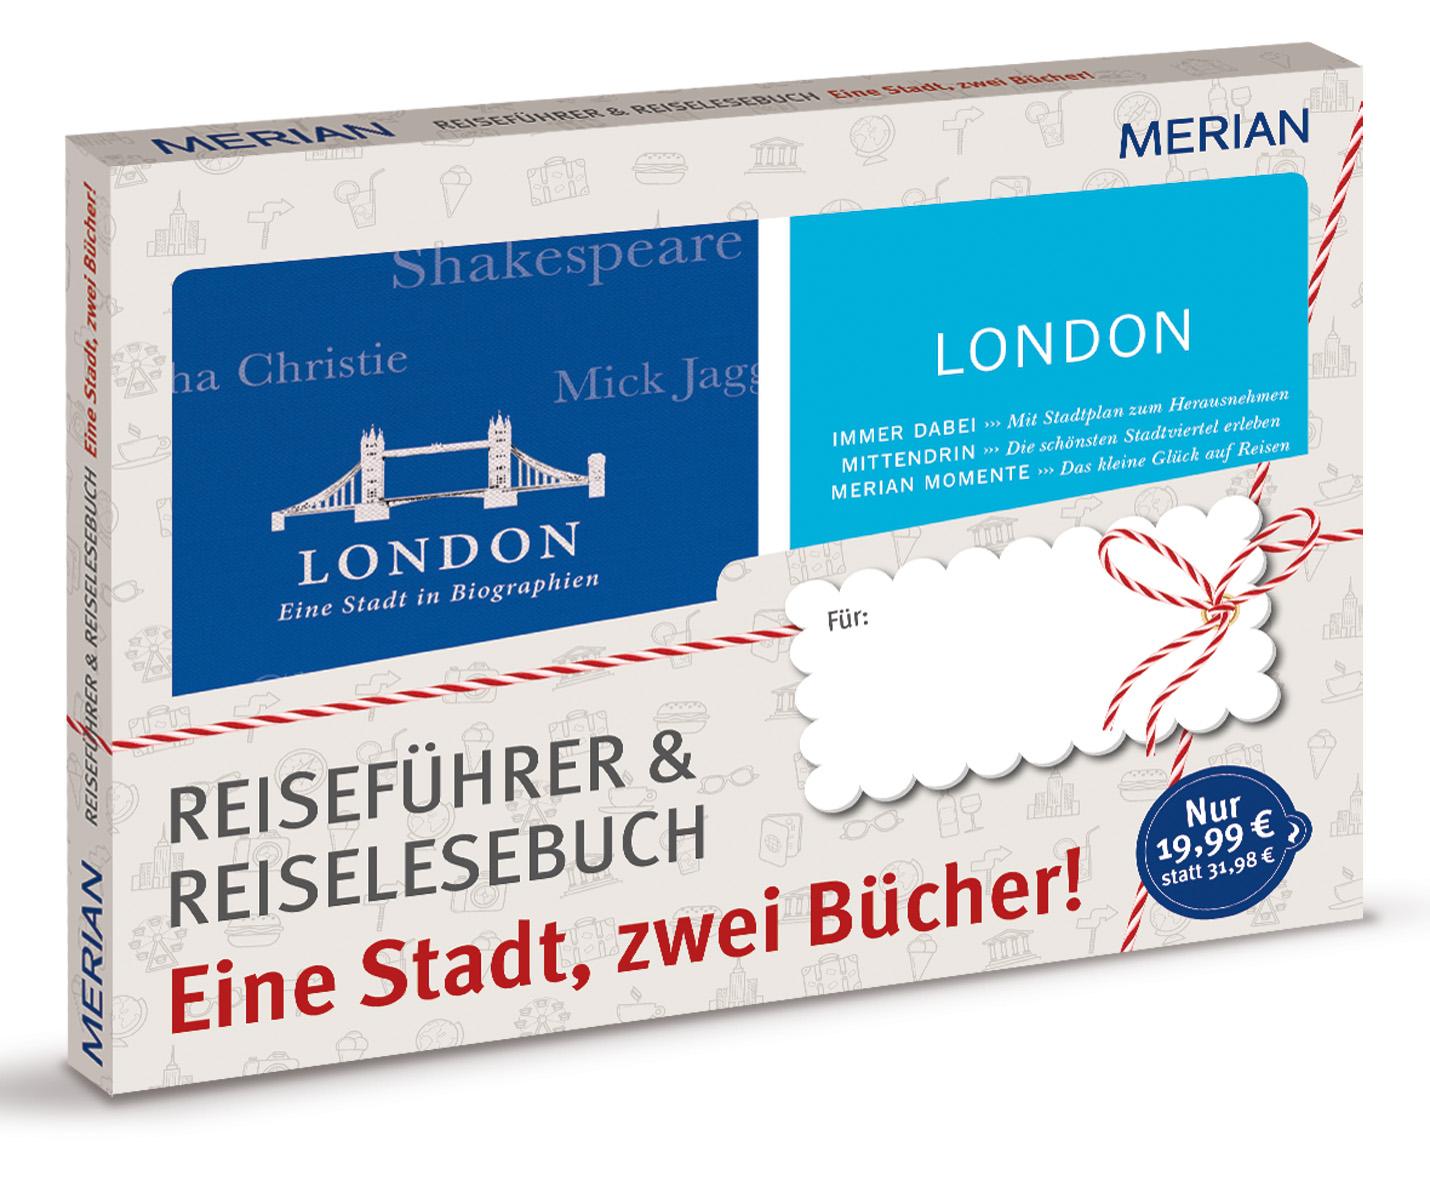 NEU London - Eine Stadt, zwei Bücher Marina Bohlmann-Modersohn 224309